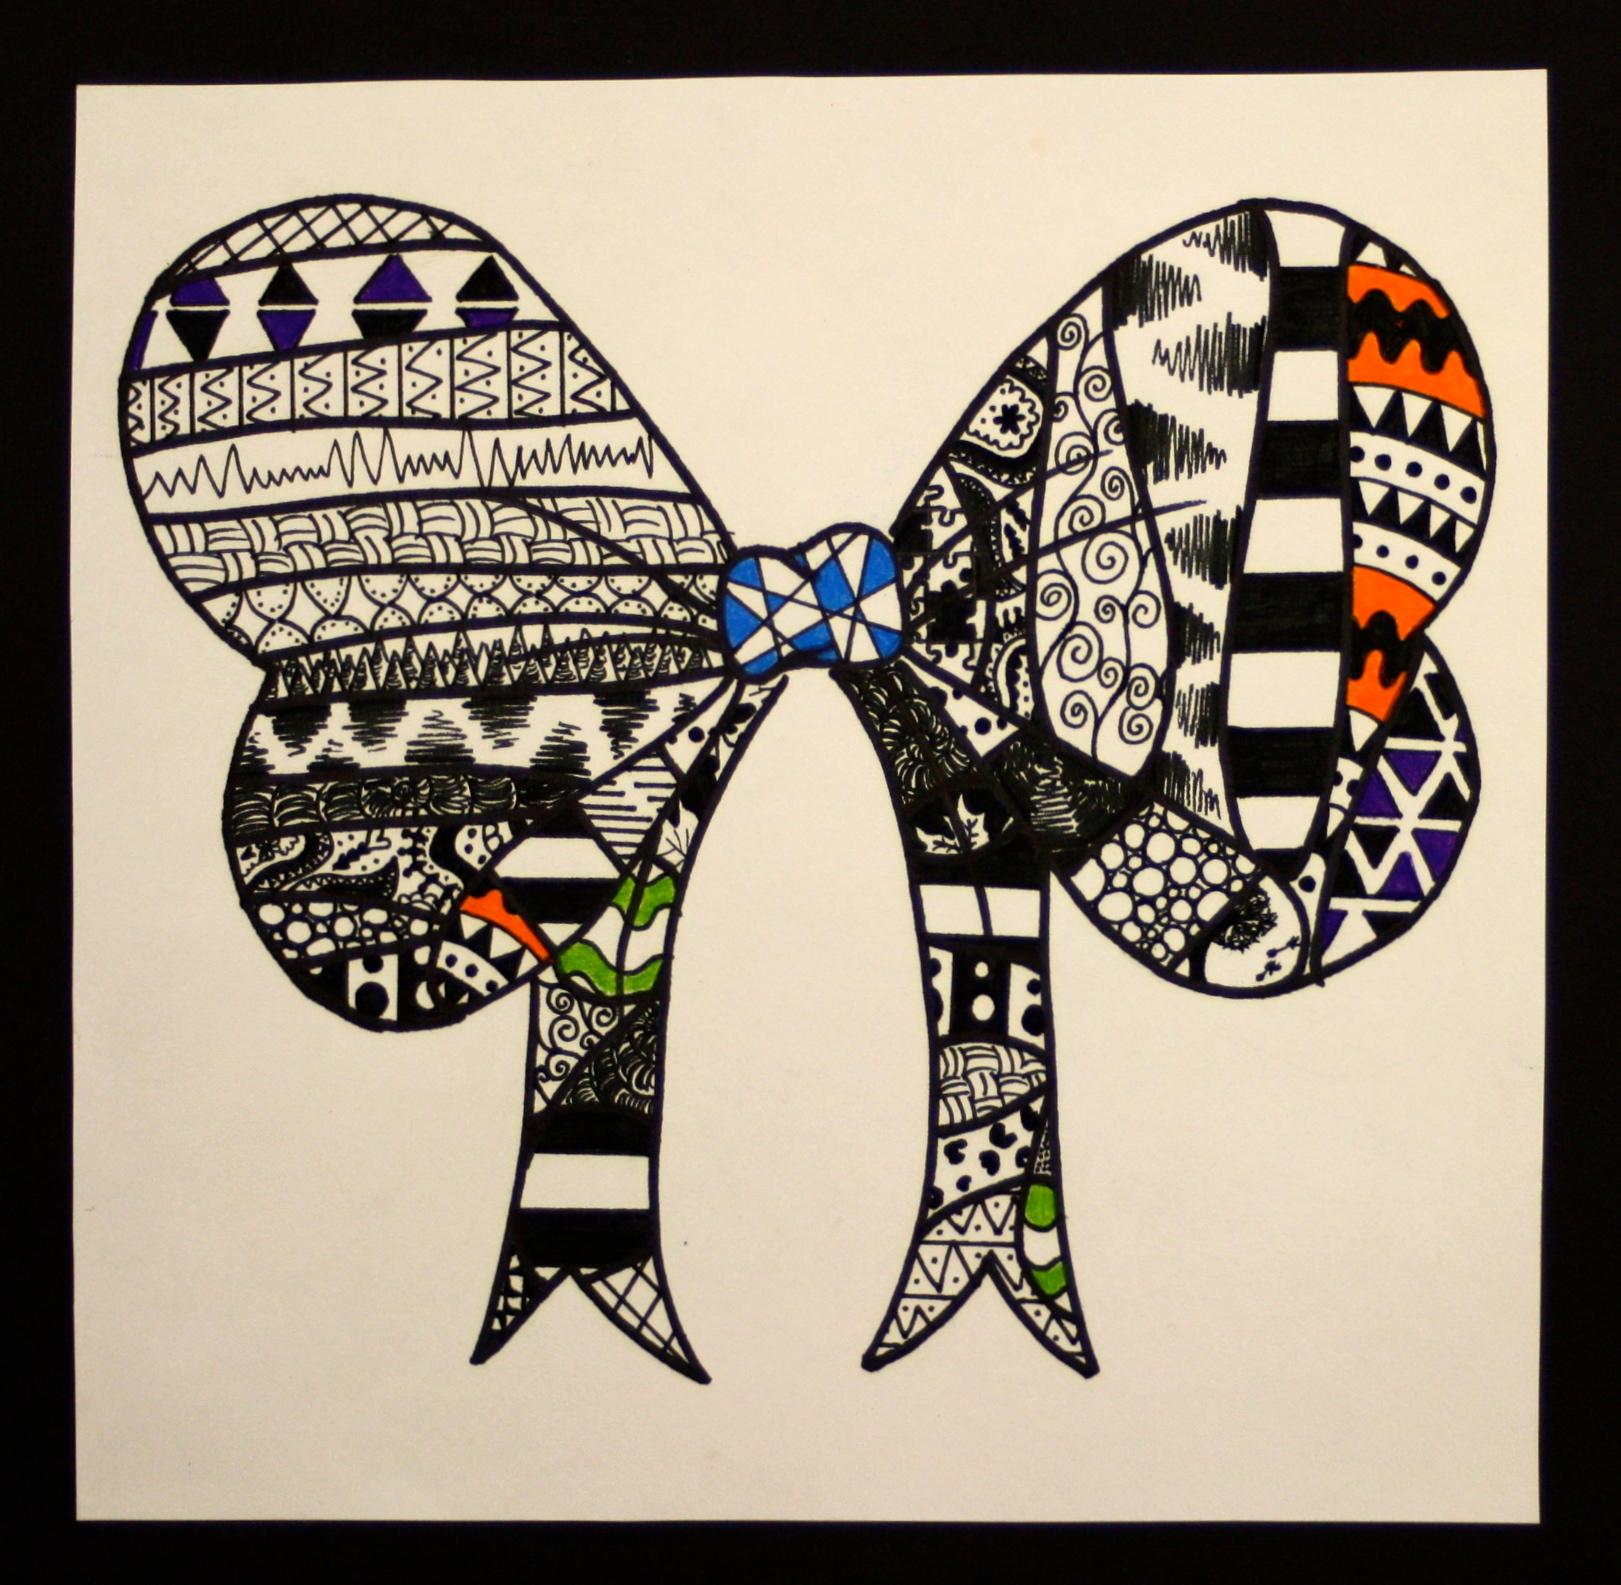 Art Design Drawing : The smartteacher resource zentangle drawings